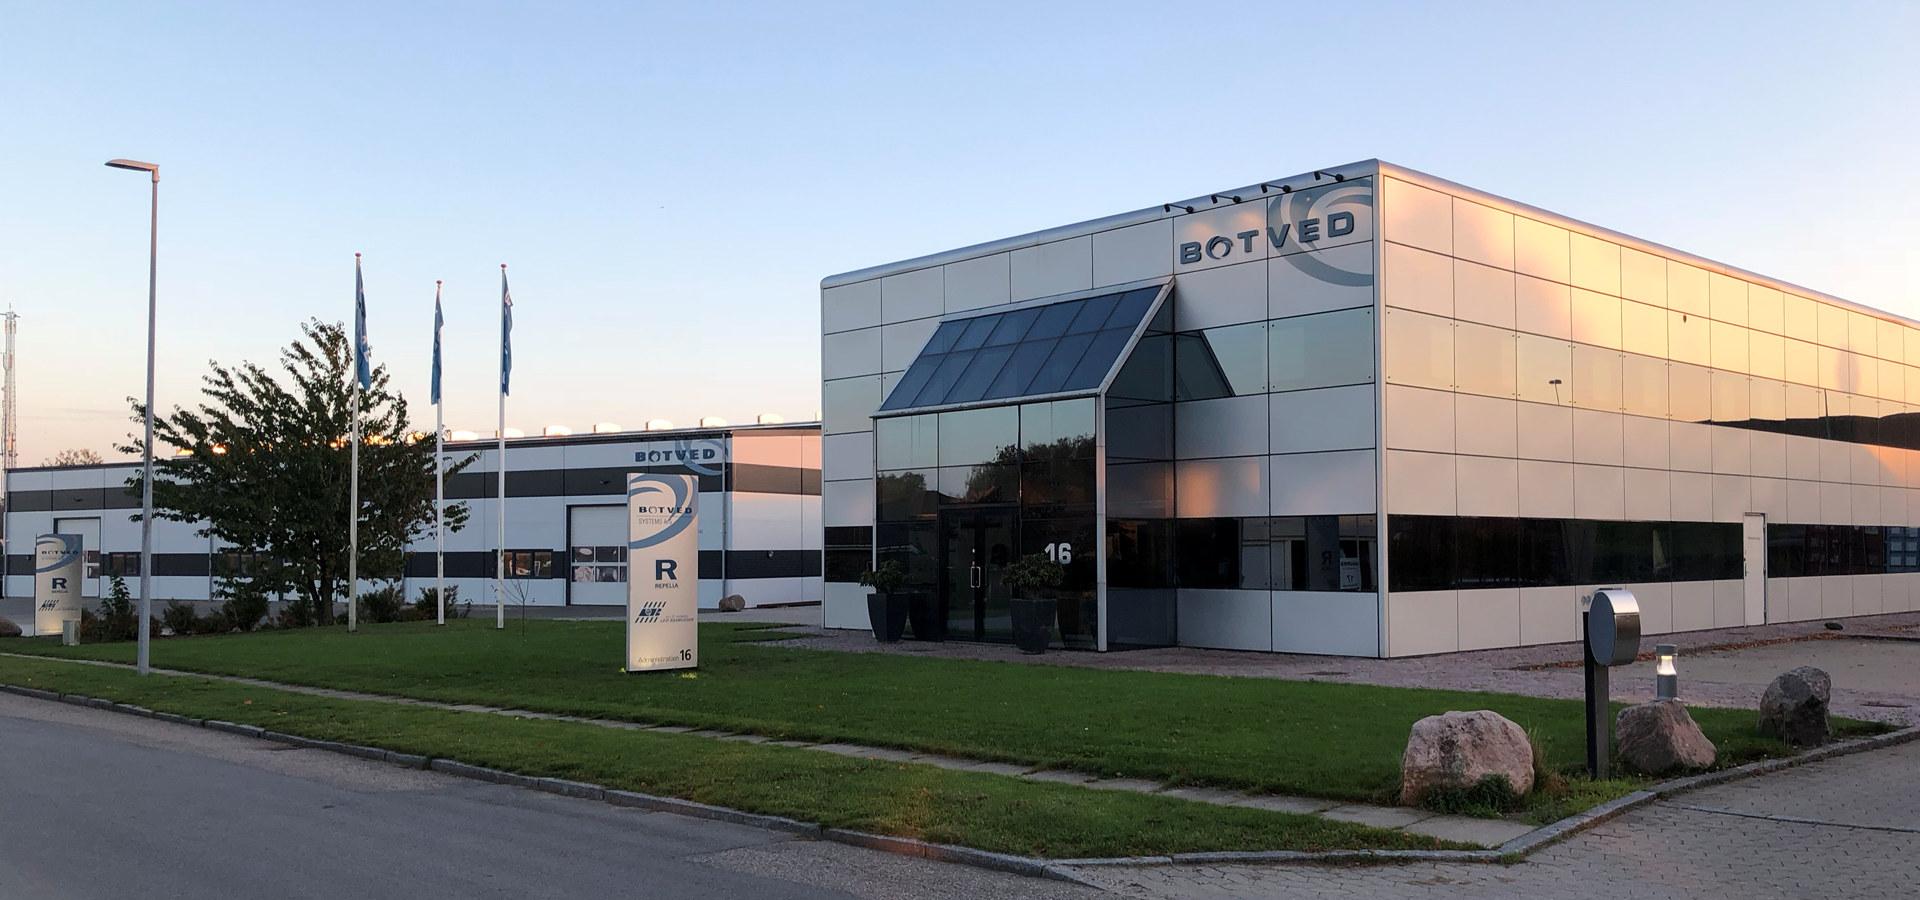 Bygget til Botved Systems A/S, leverandør til NRV